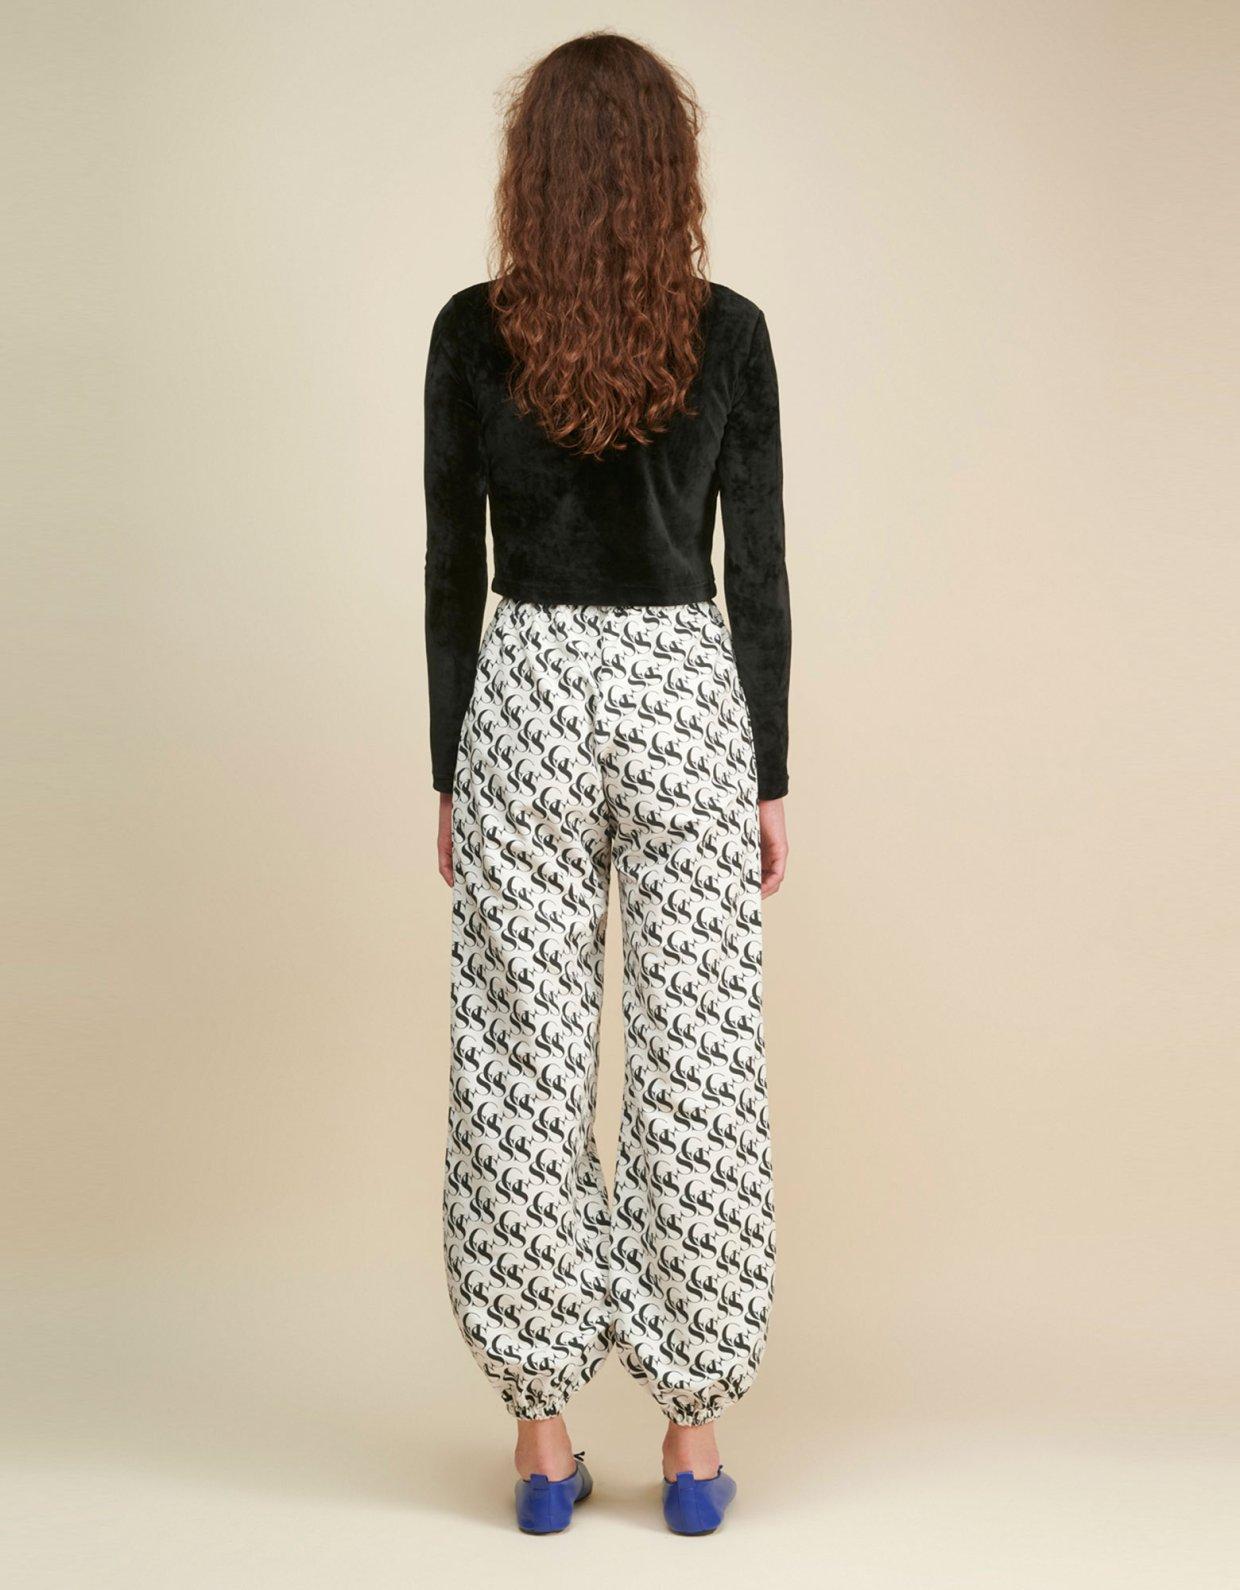 Sunset go Steeze SSG white & black track pants